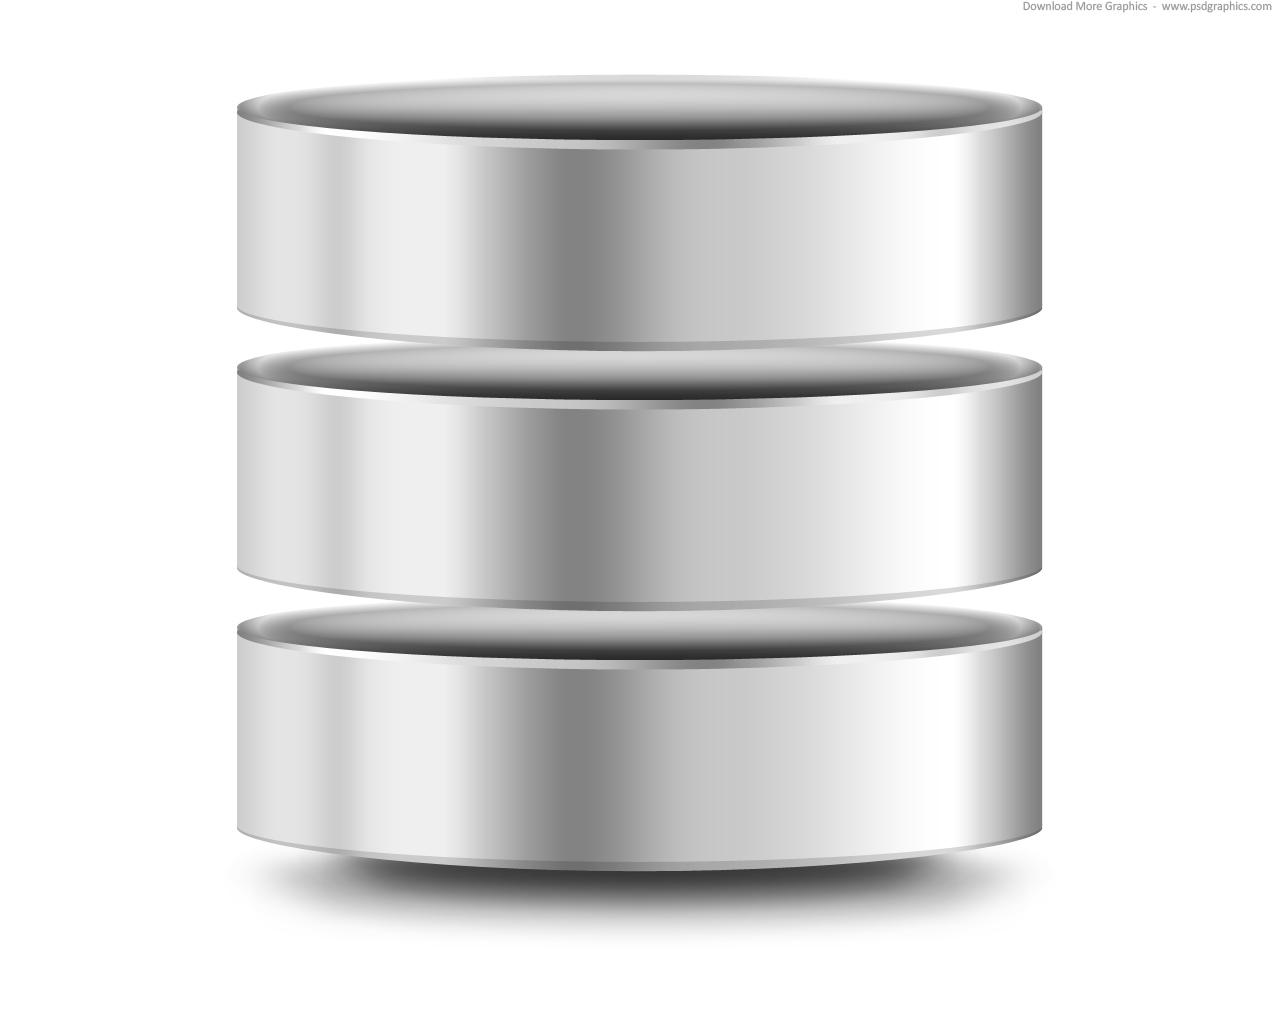 silver-database-icon